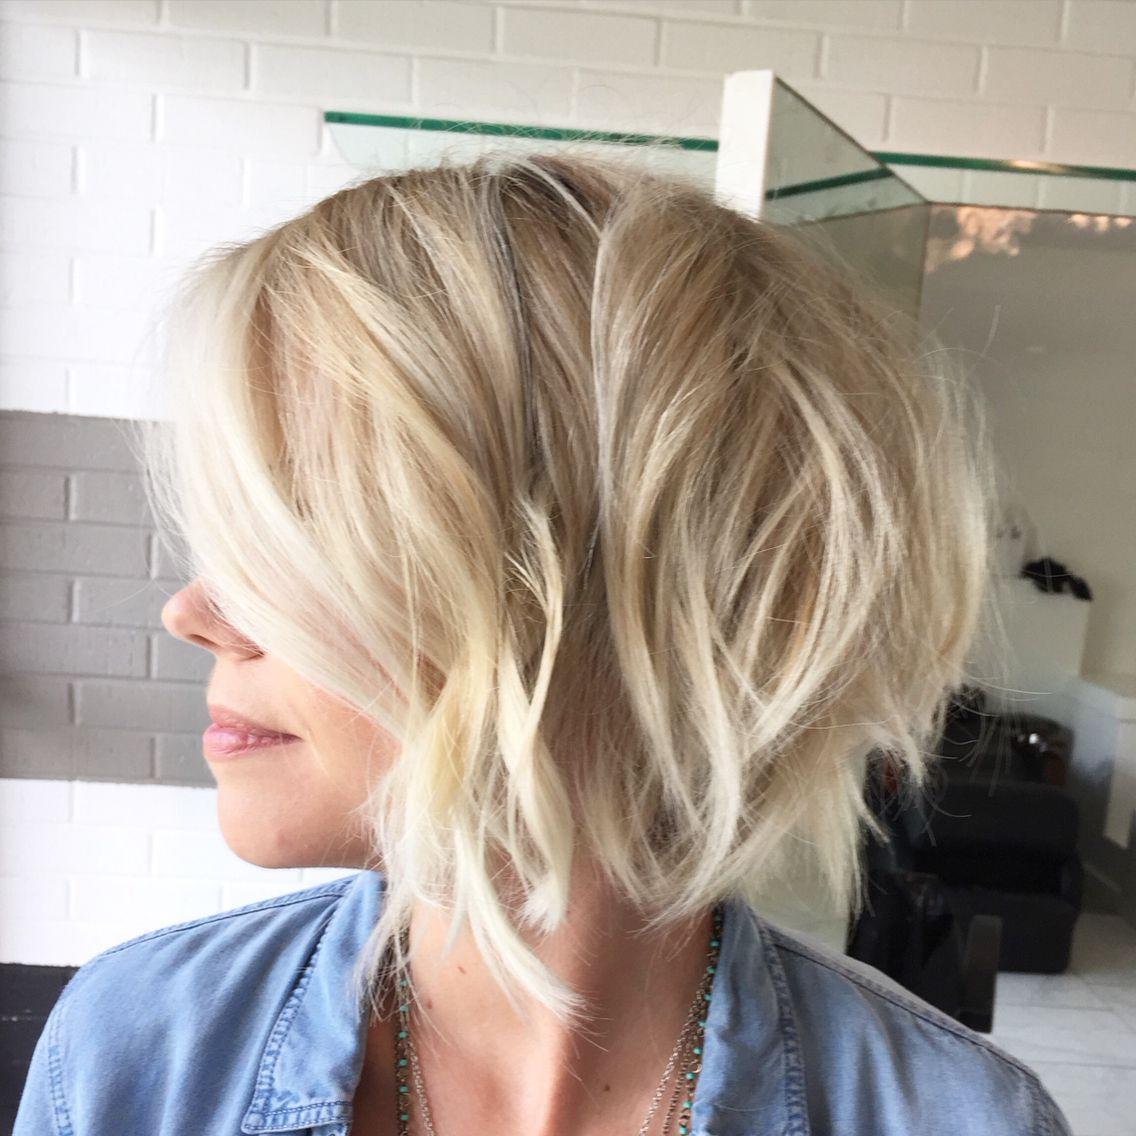 Short Hair Cut Textured Bob Blonde Hair Low Maintenance Hair Color With Regard To Easy Maintenance Short Haircuts (View 18 of 25)